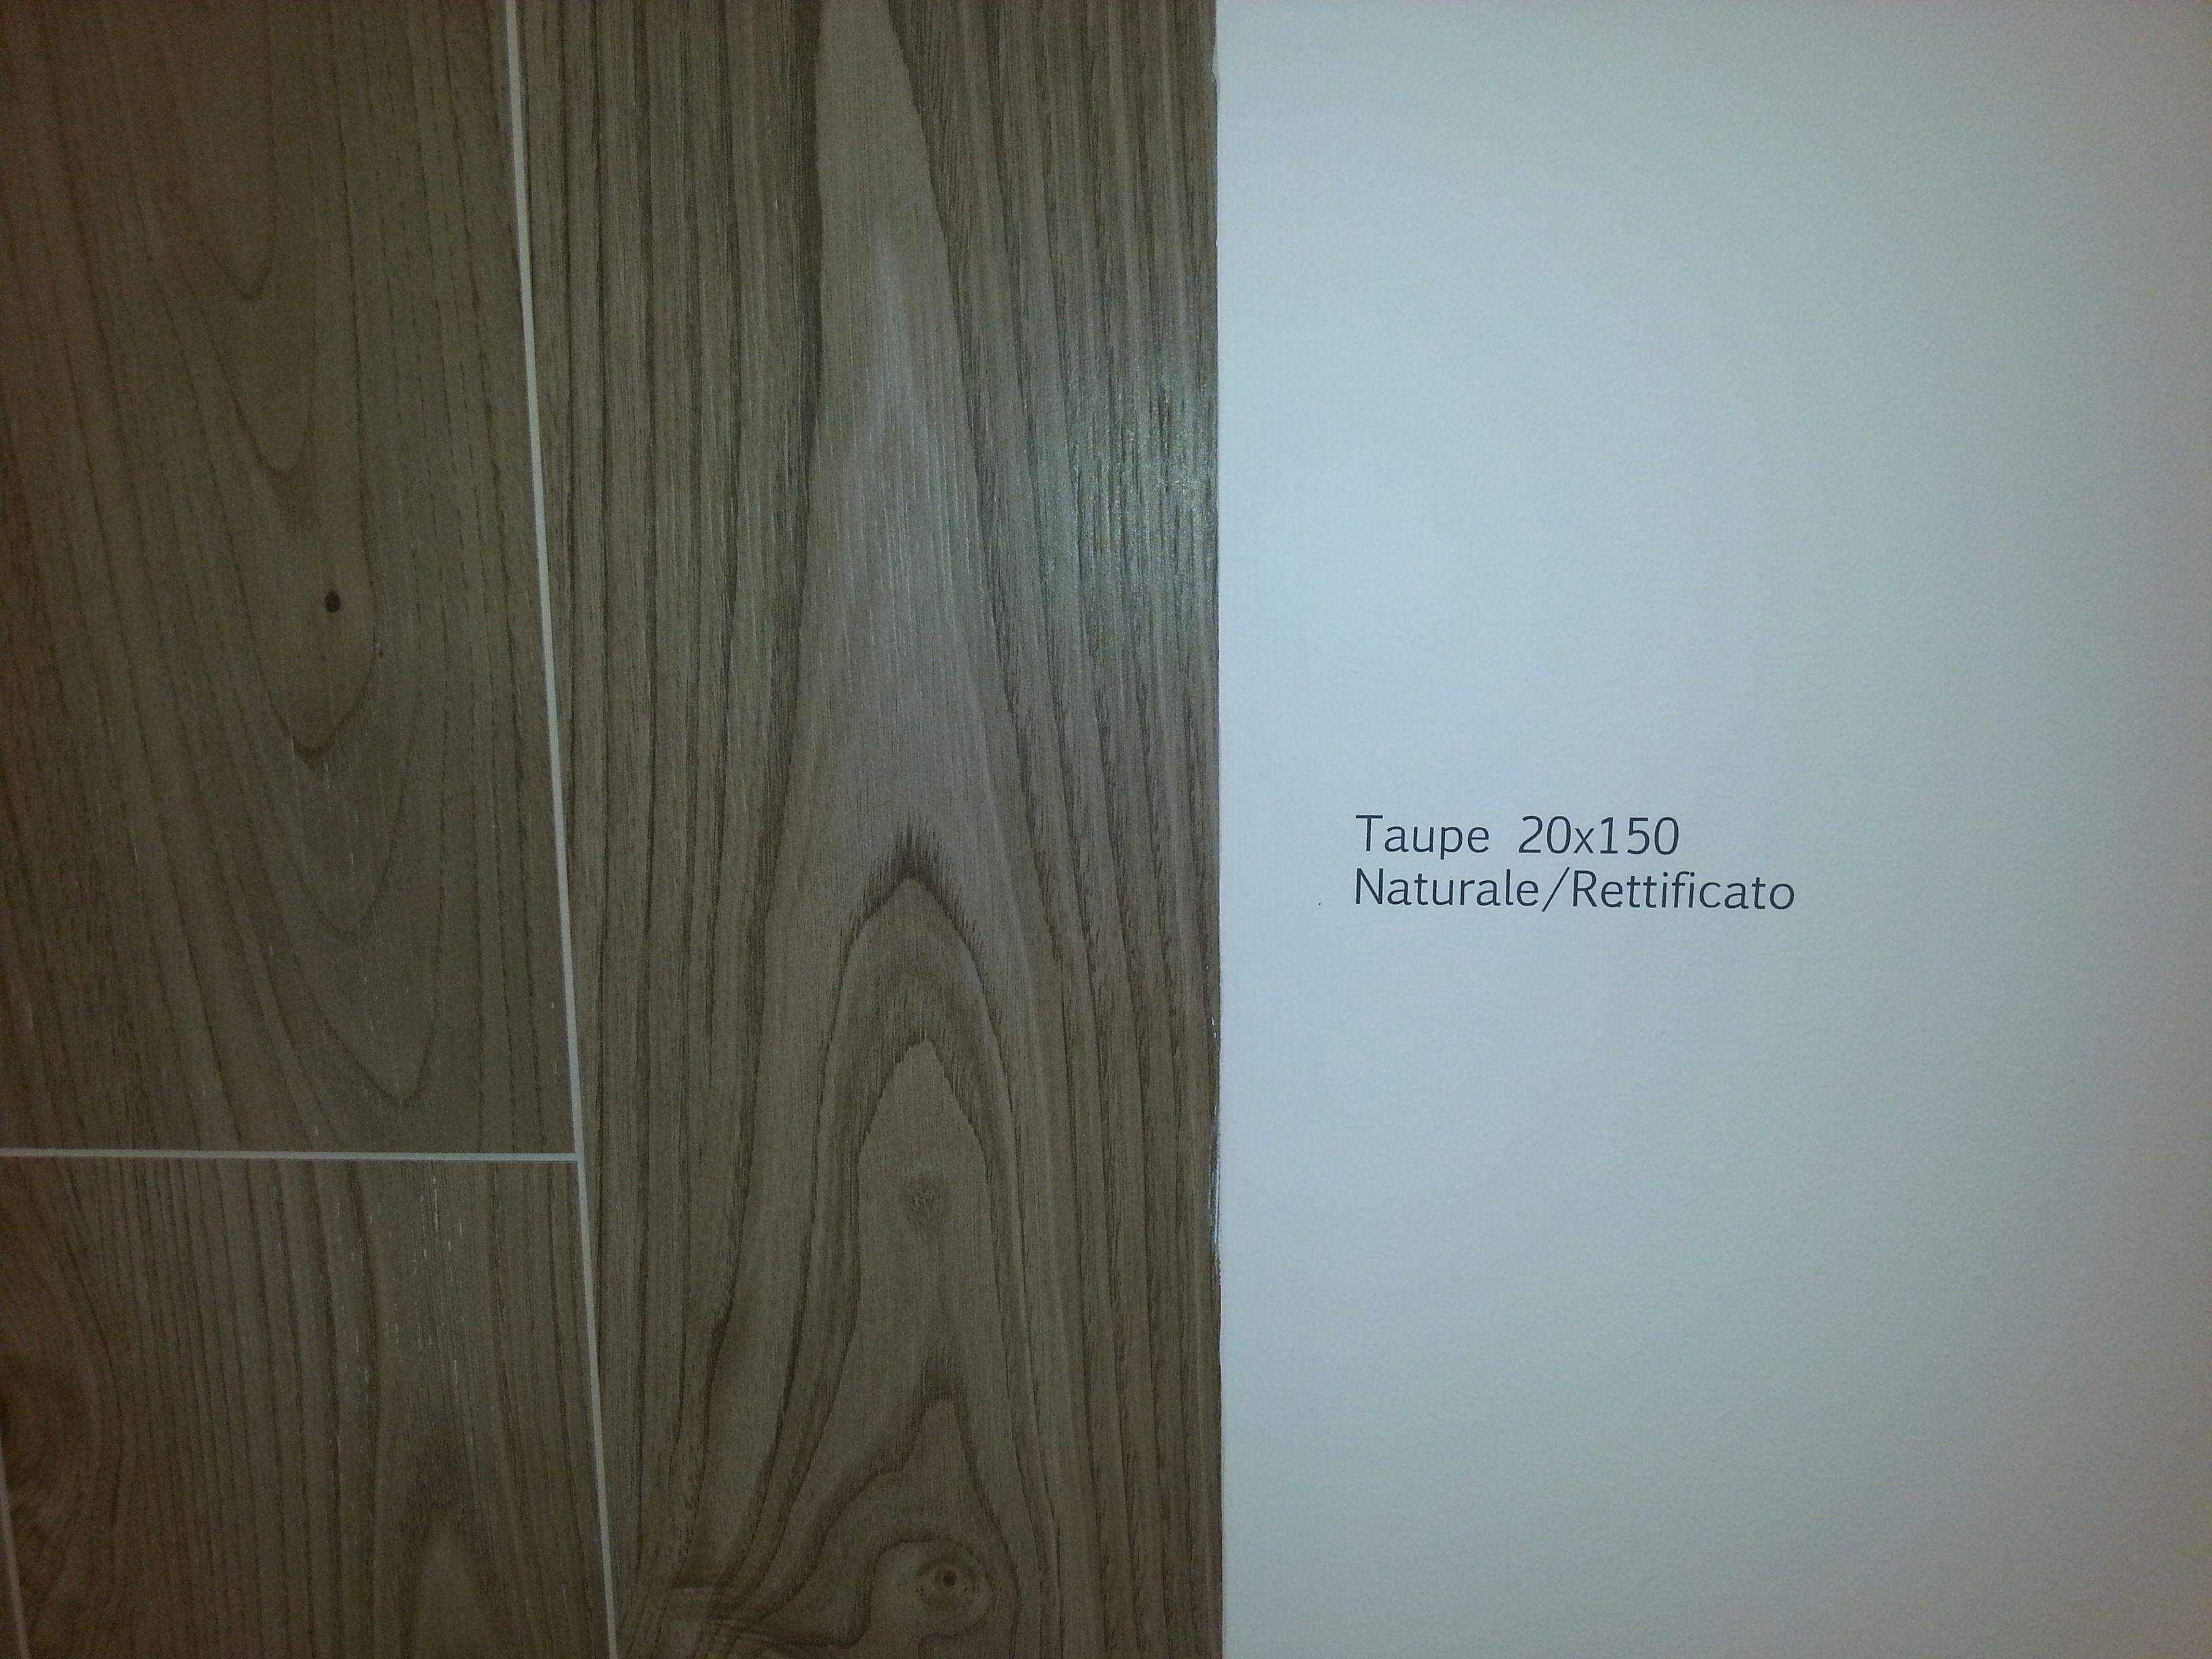 #coem #ceramichecoem #madeinitaly #tiles #floor #covering #indoor #design #ecology #eco #cucina #legno